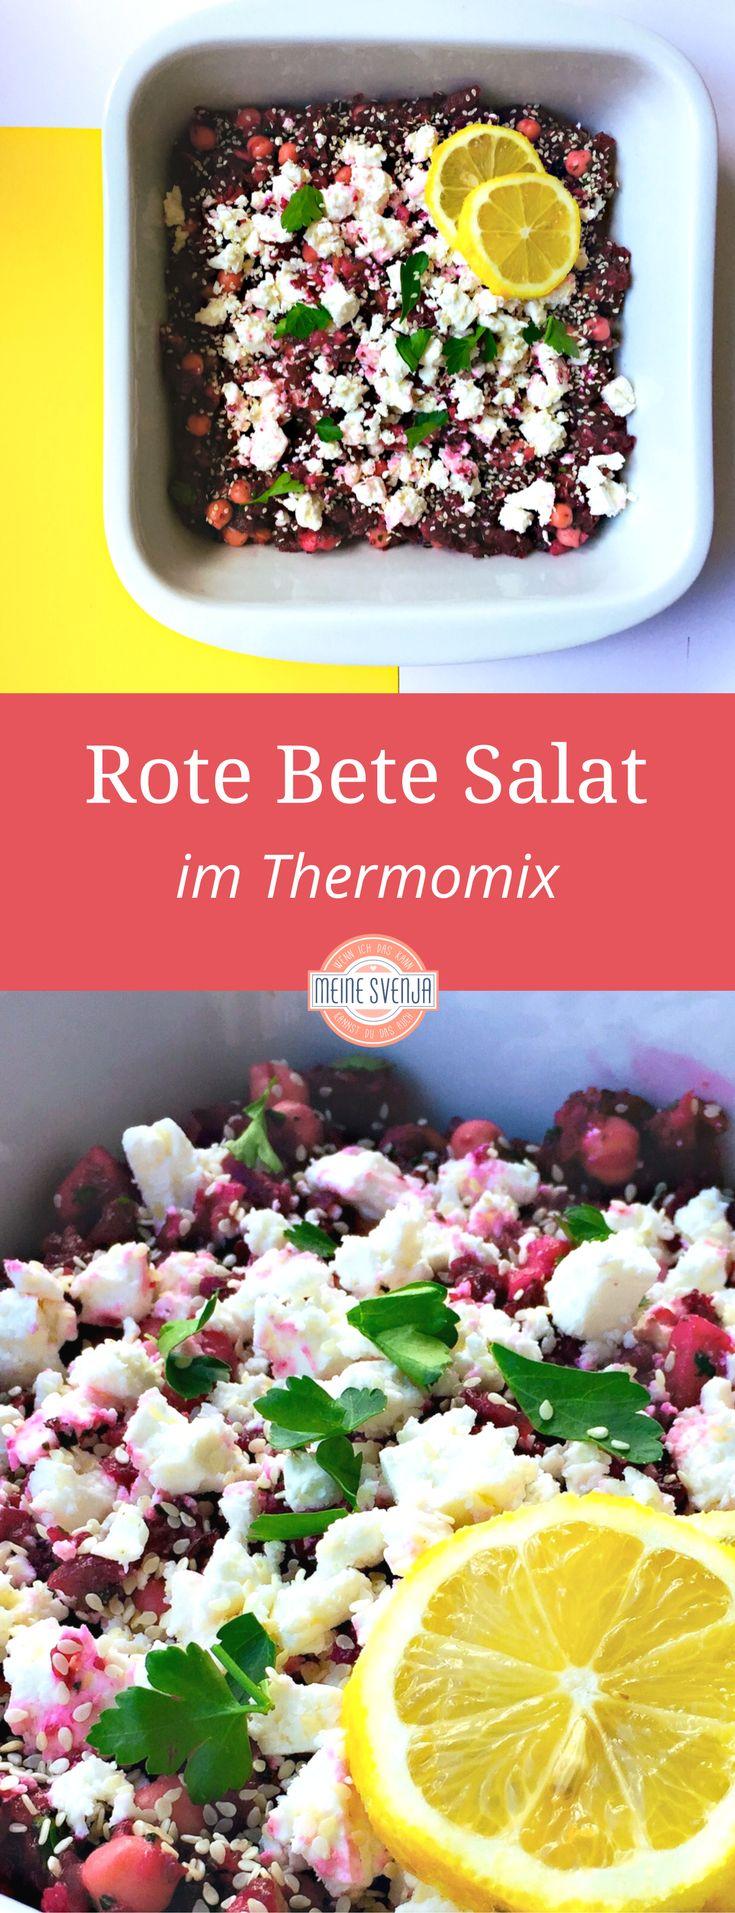 Rote Bete Salat im Thermomix – meinesvenja